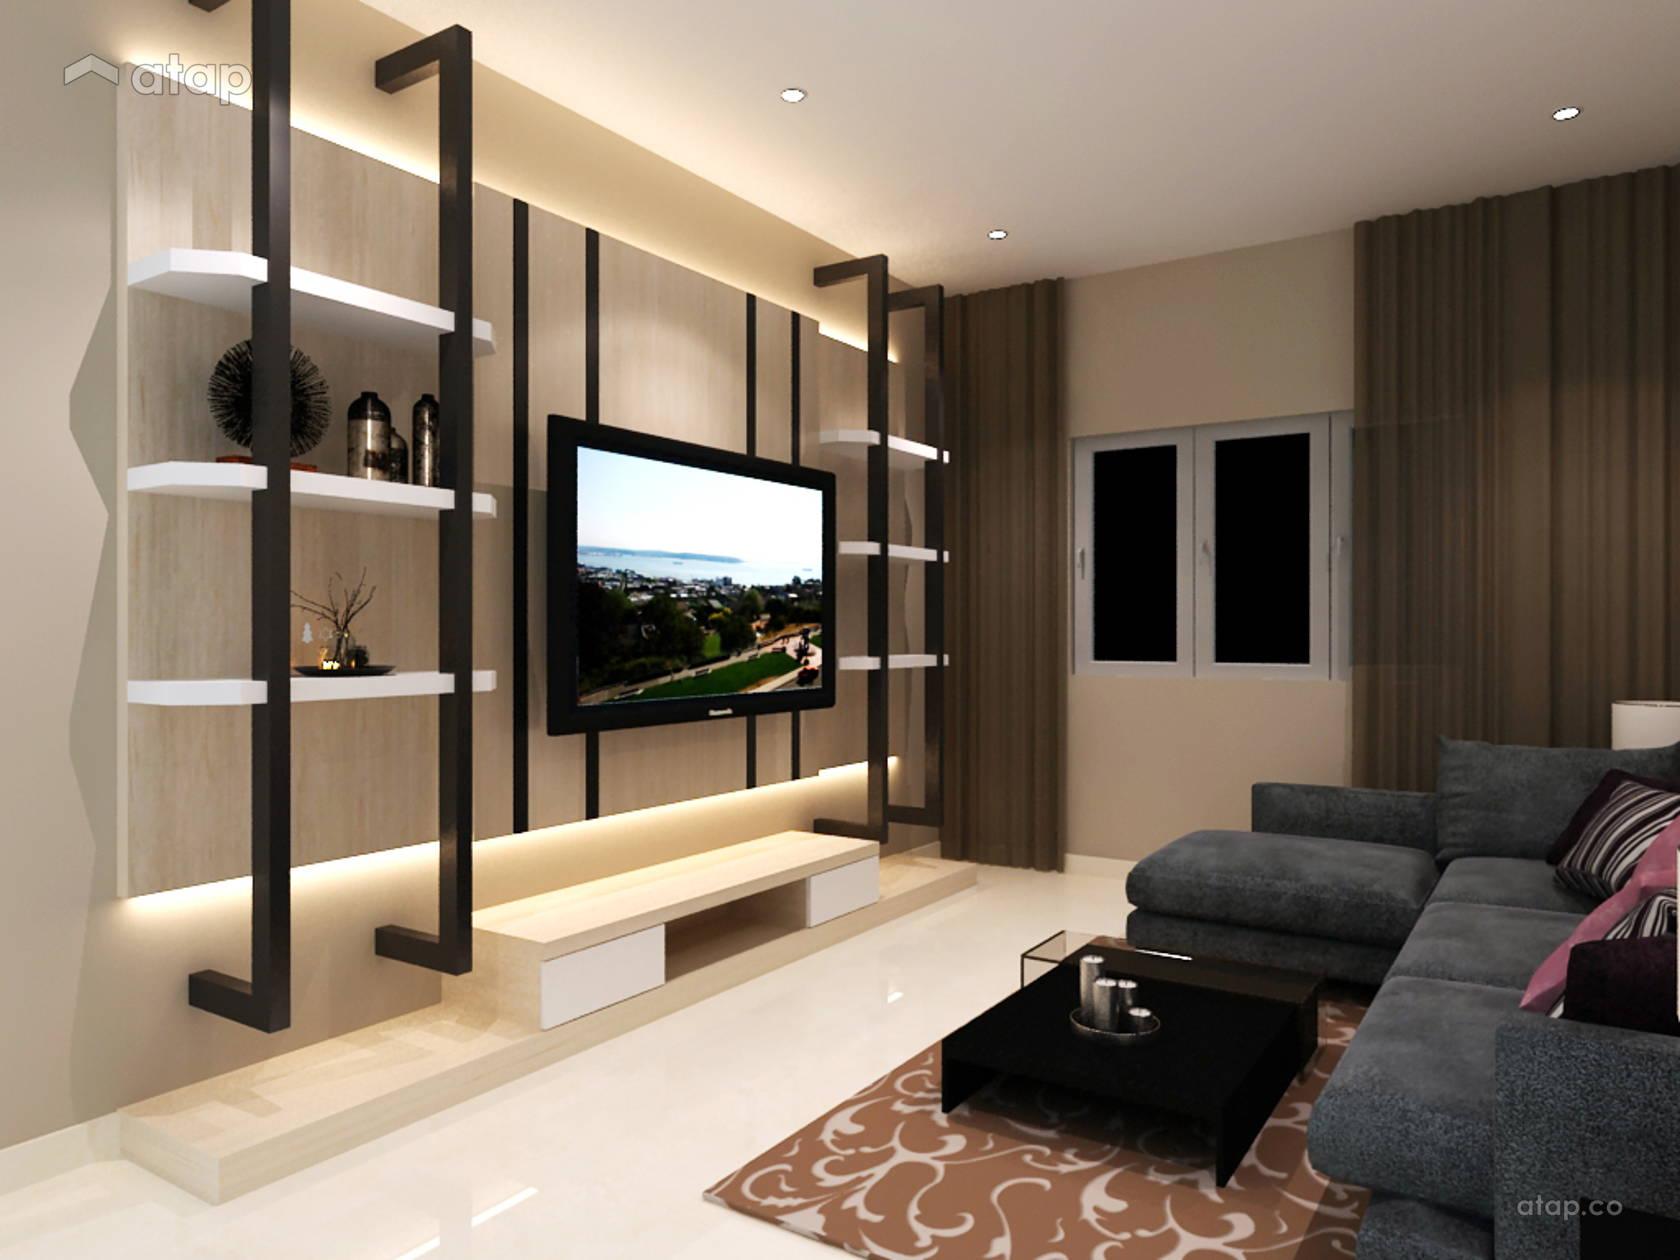 Single Storey Bungalow interior design renovation ideas, photos and ...